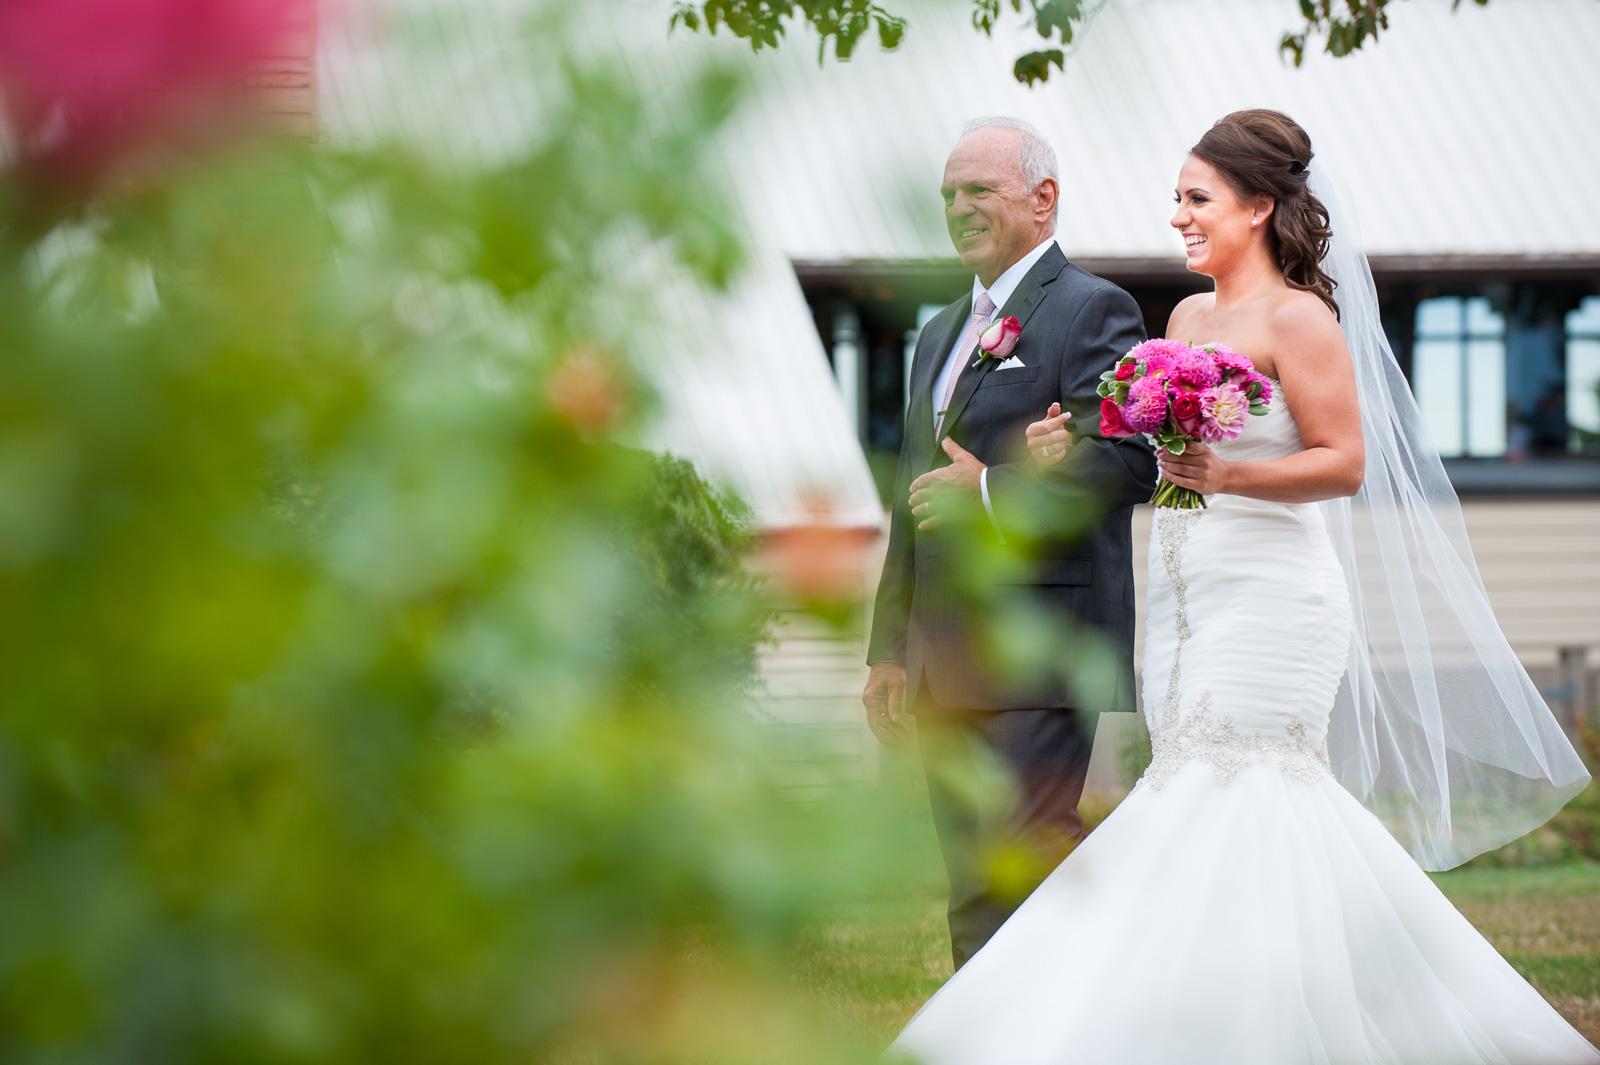 victoria-wedding-photographers-burnaby-mountain-wedding-burnaby-rowing-club-wedding-9.jpg